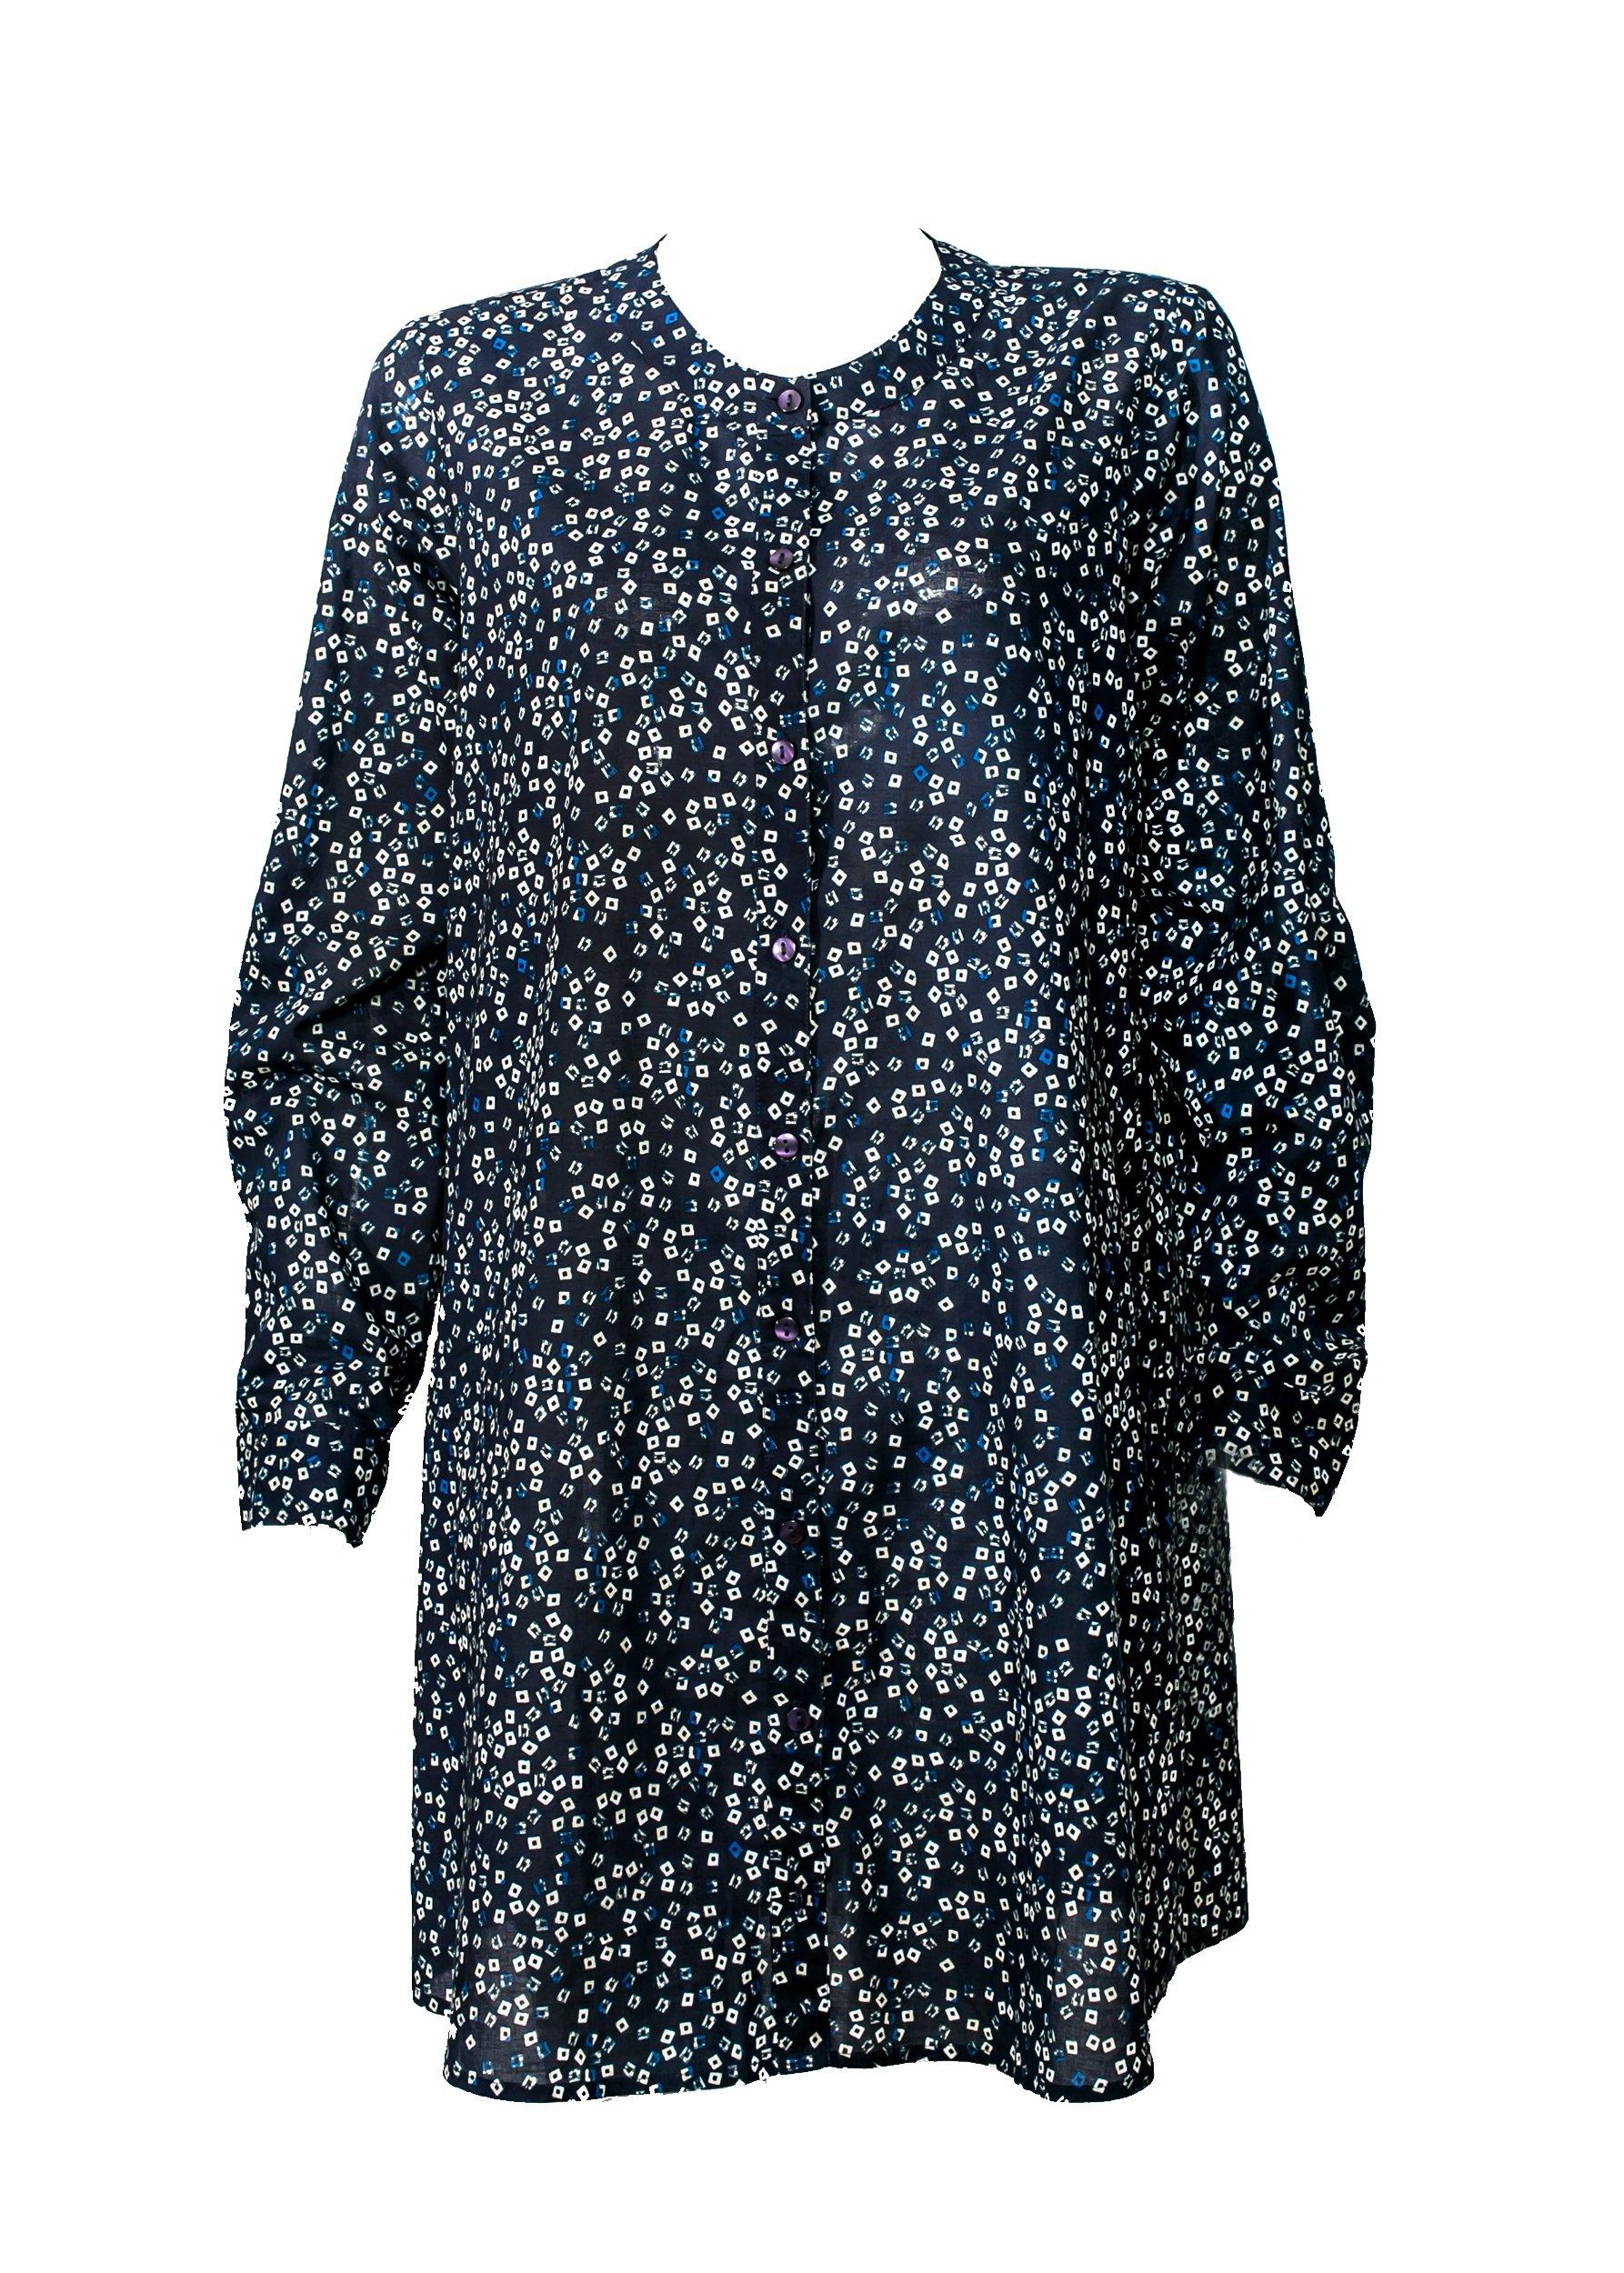 Bawełniana Sukienka Tunika Plażowa Triumph 38